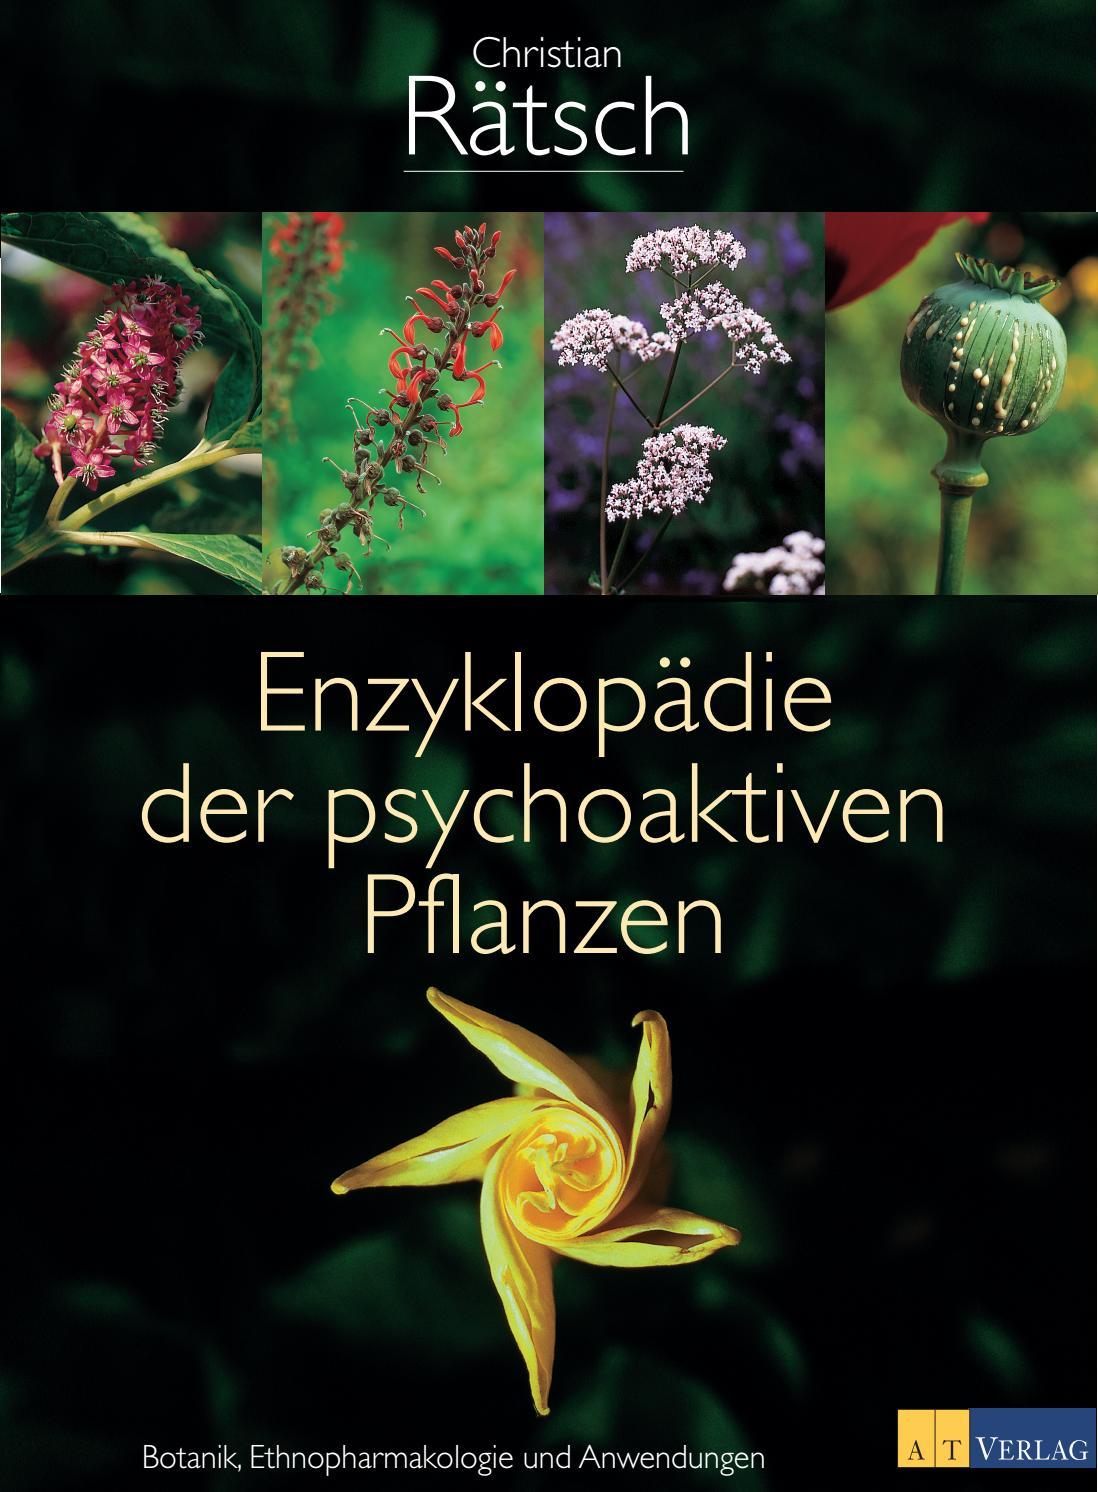 Kardamom Elettaria cardamomum Pflanze 20cm Malabar-Kardamom Zimt-Kardamom Ingwer